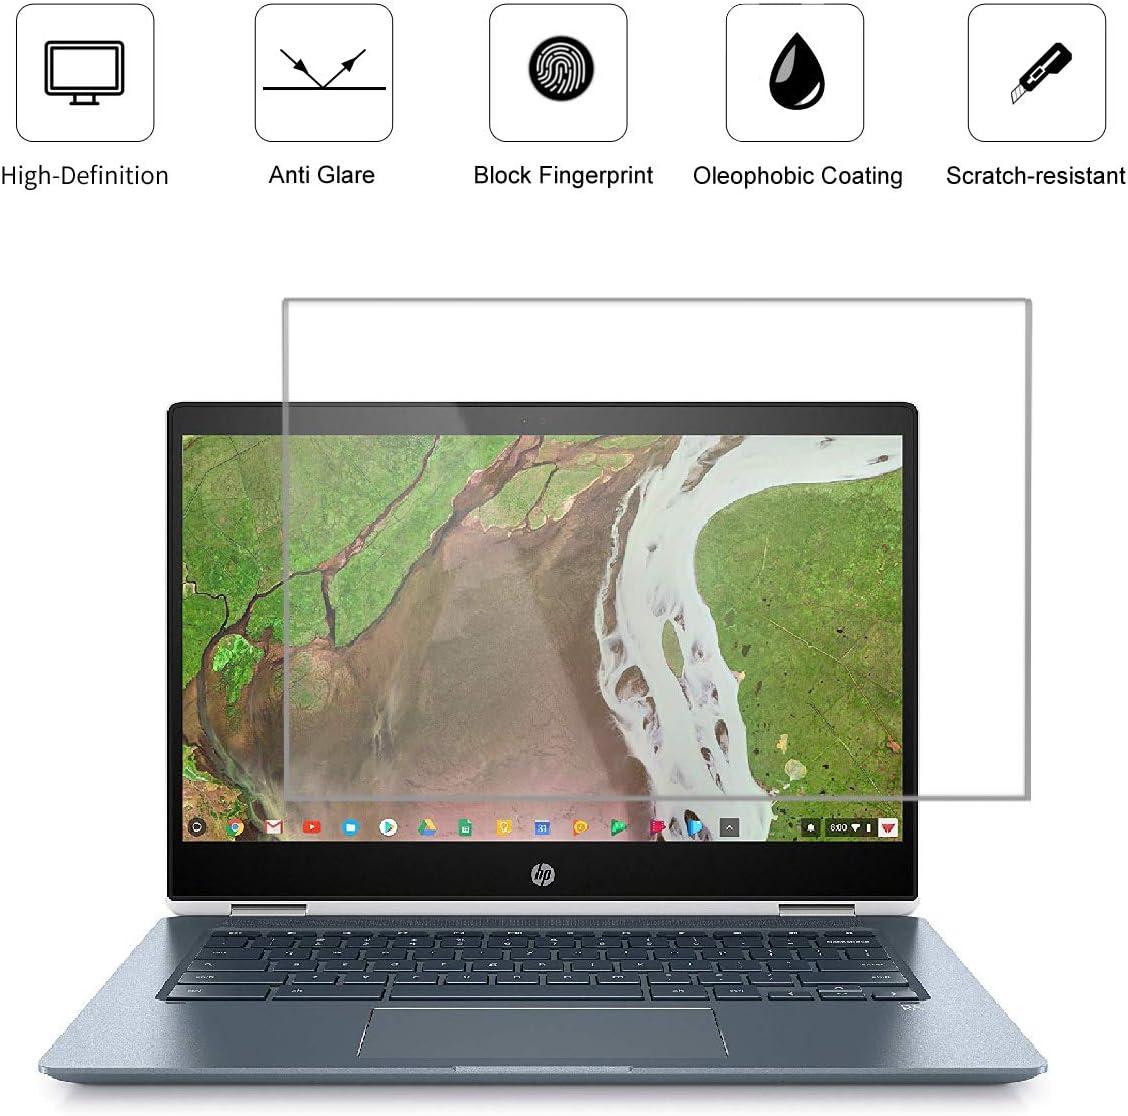 "(2 Pack) 14 Inch Screen Protector for HP Pavilion 14 |ChromeBook 14 |Stream 14, Lenovo Flex 14, Dell Insprion 14, Acer Chromebook 14, Lg Gram 14"", Anti Glare and Anti Fingerprint (Matte) Shield"